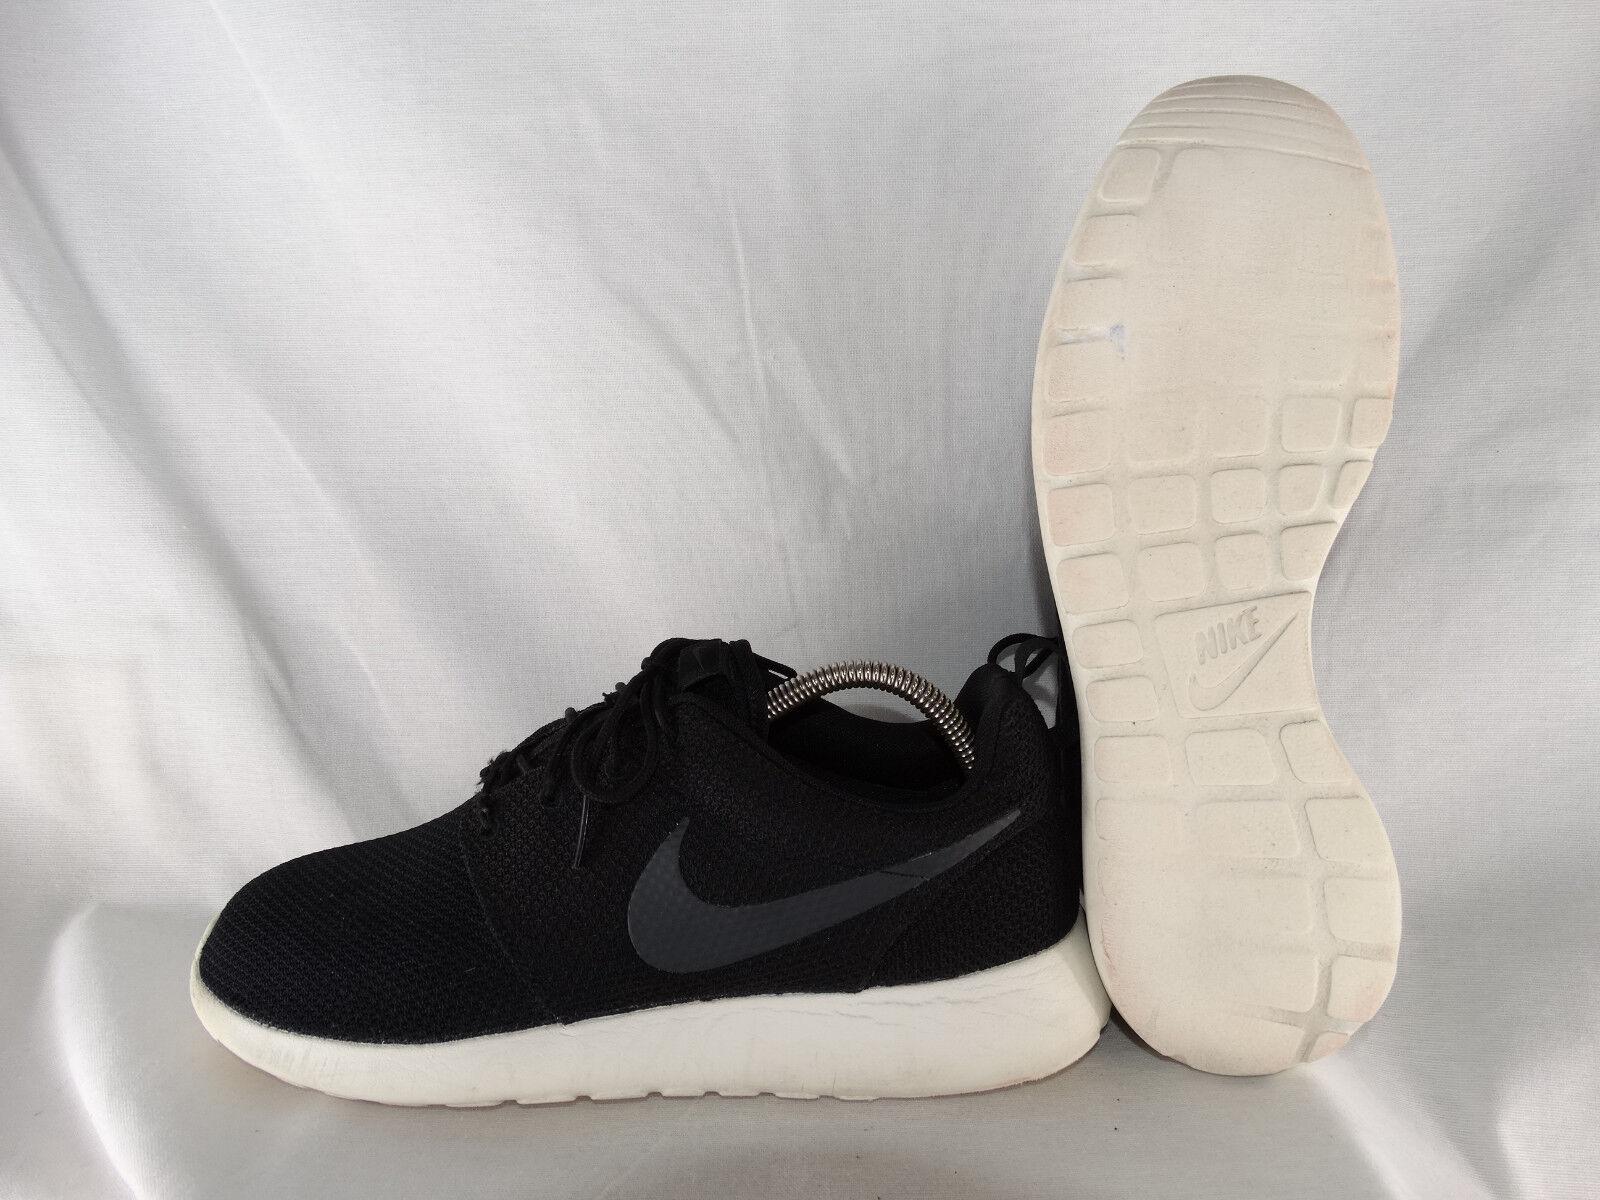 Nike Roshe One Laufschuhe 511881-010 schwarz-weiß EU 44 US 10